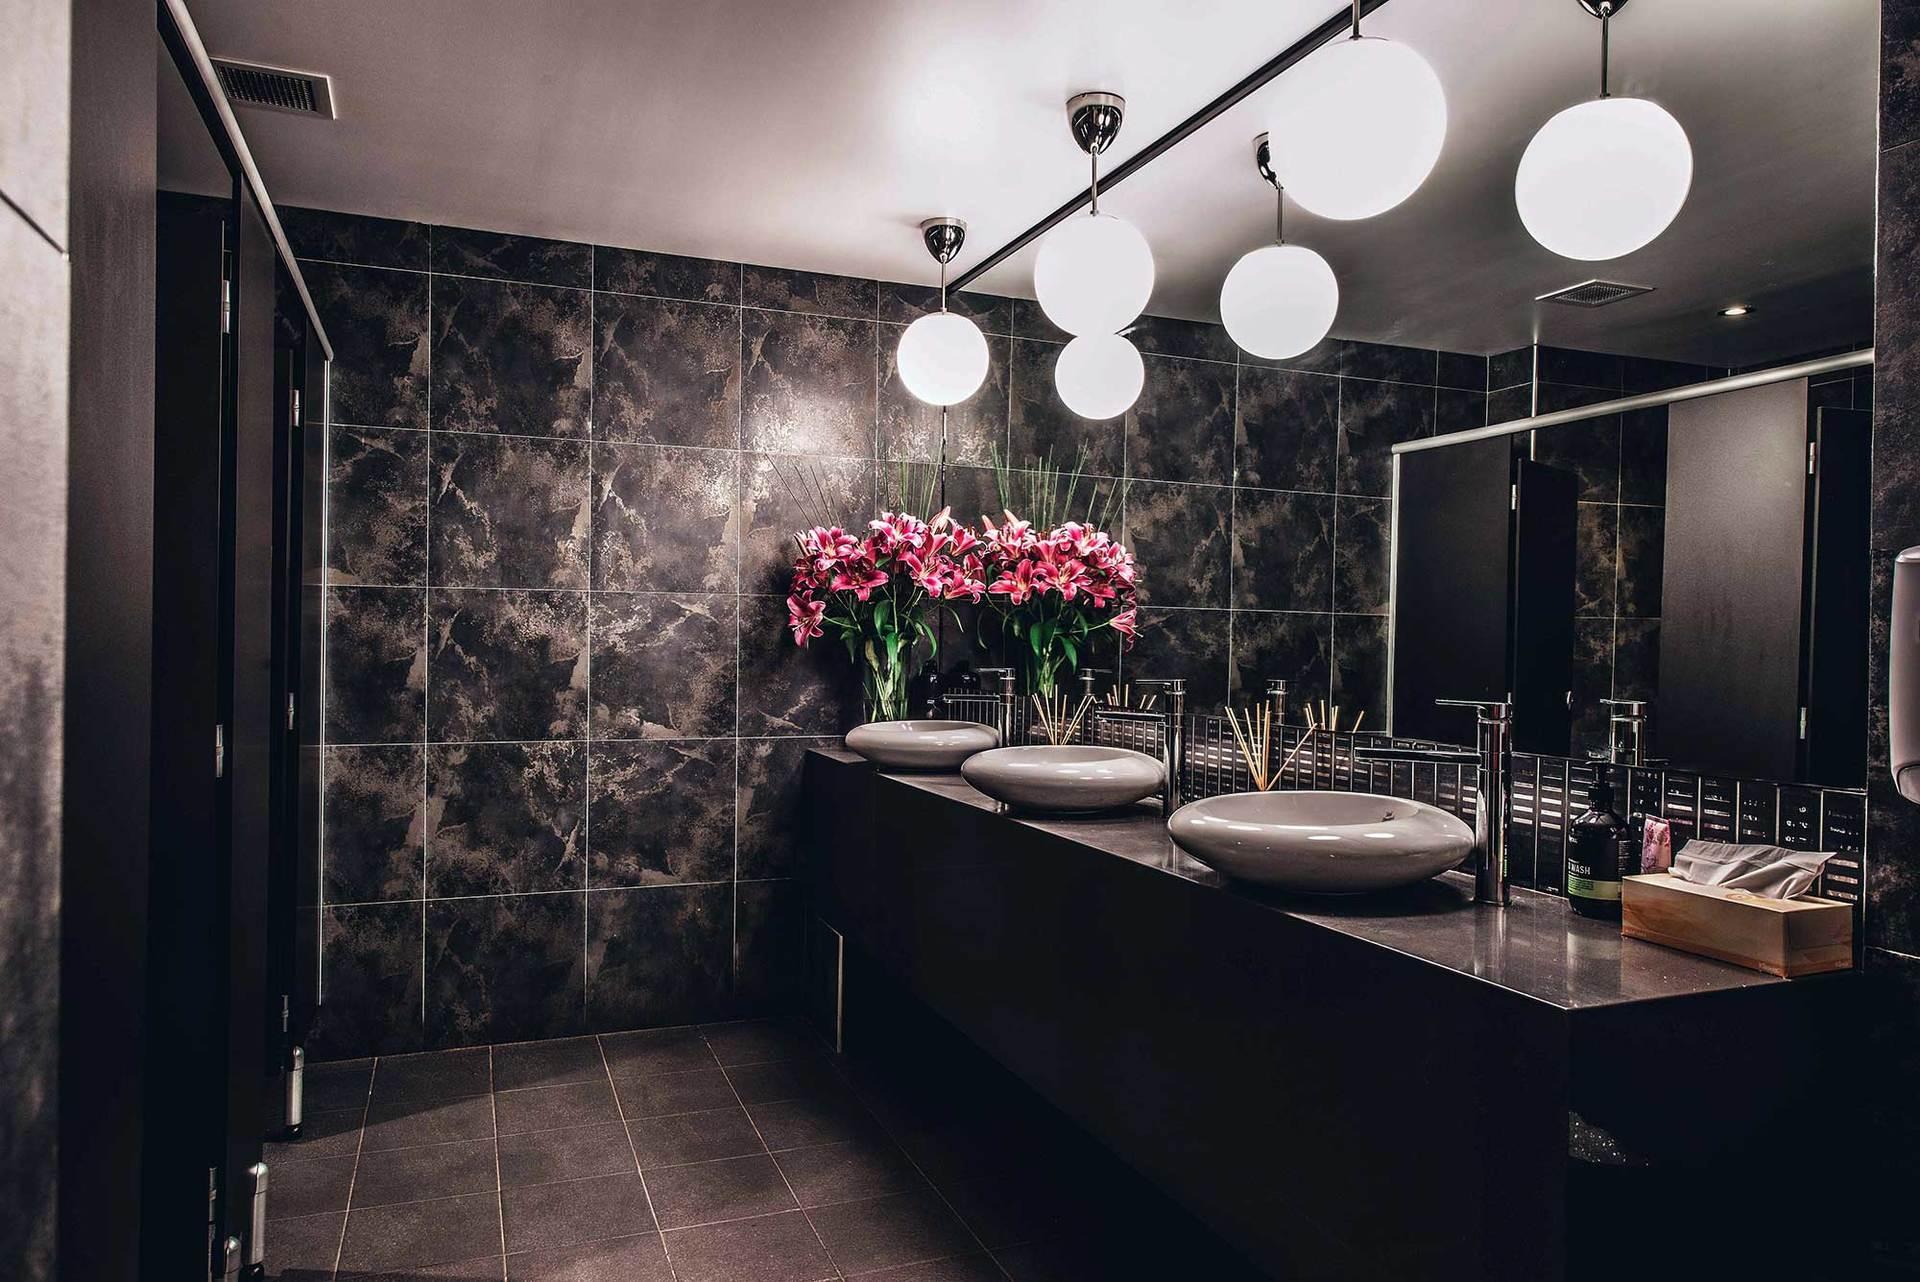 Chop 'n Chill Restaurant Customers Toilet / Restroom